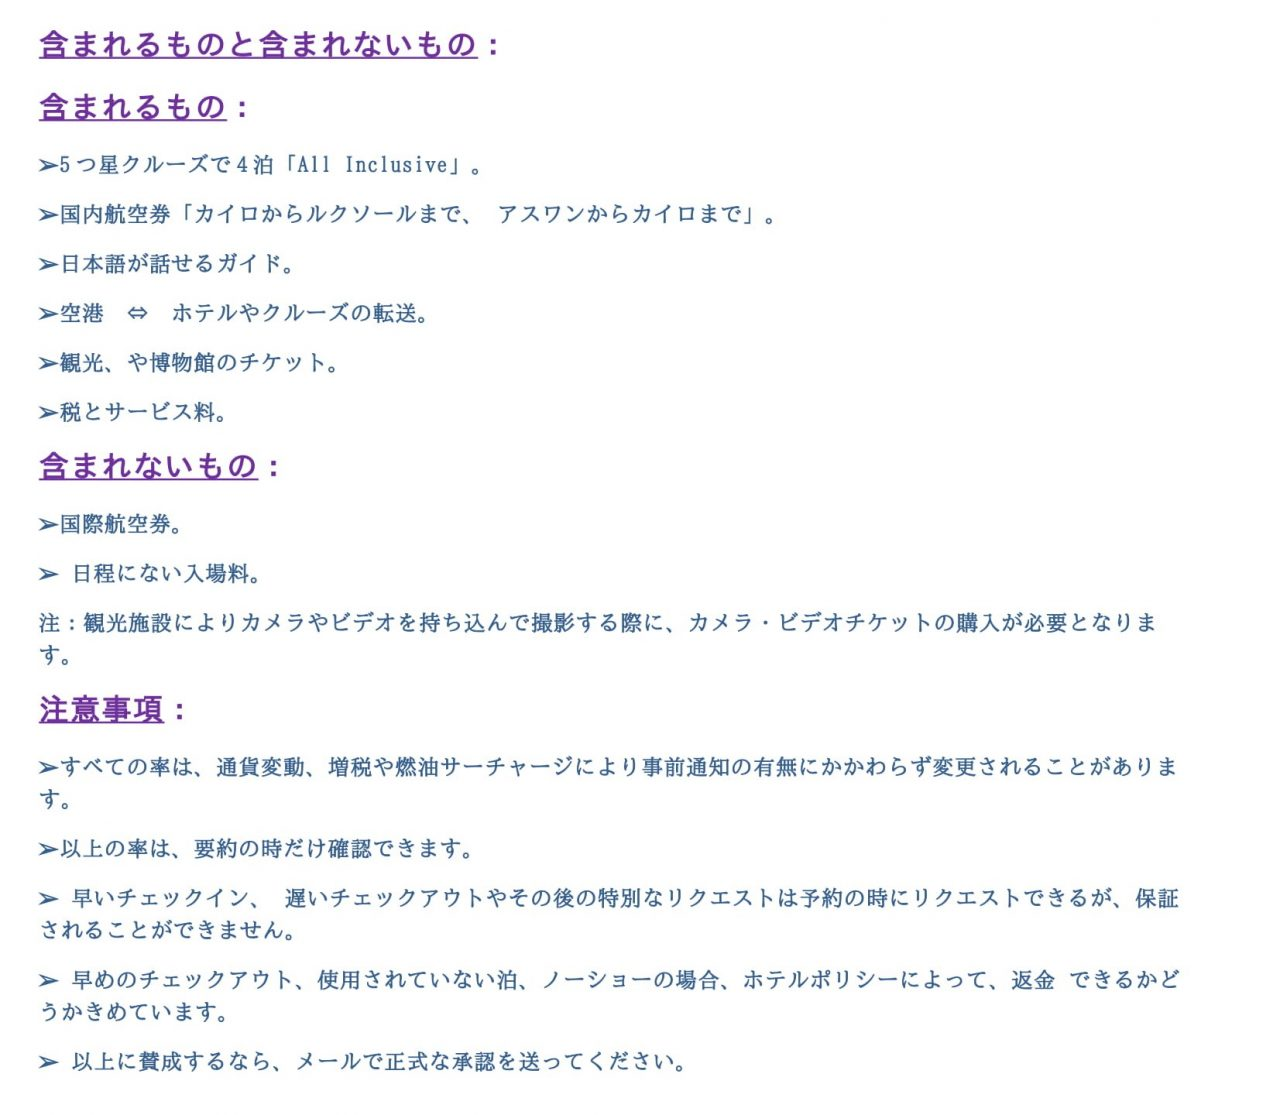 https://traveda.net/wp-content/uploads/2019/03/LUXOR-ASWAN-CRUISE-05DAYS-04NIGHTS-Japanese-2-1280x1115.jpg